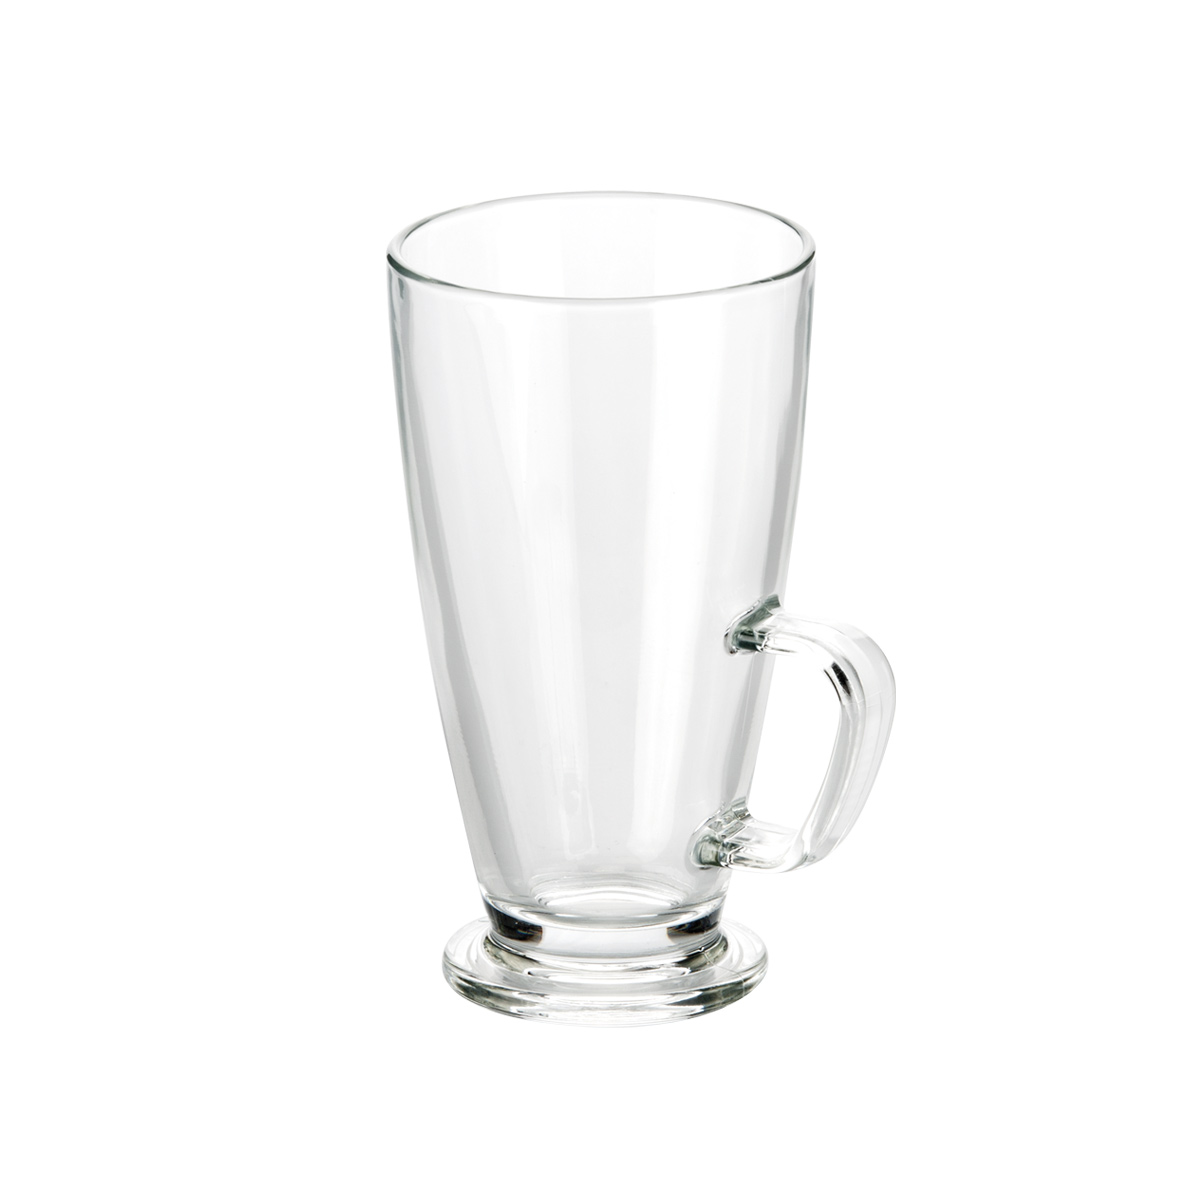 Skleněný hrnek latté macchiato CREMA 300 ml